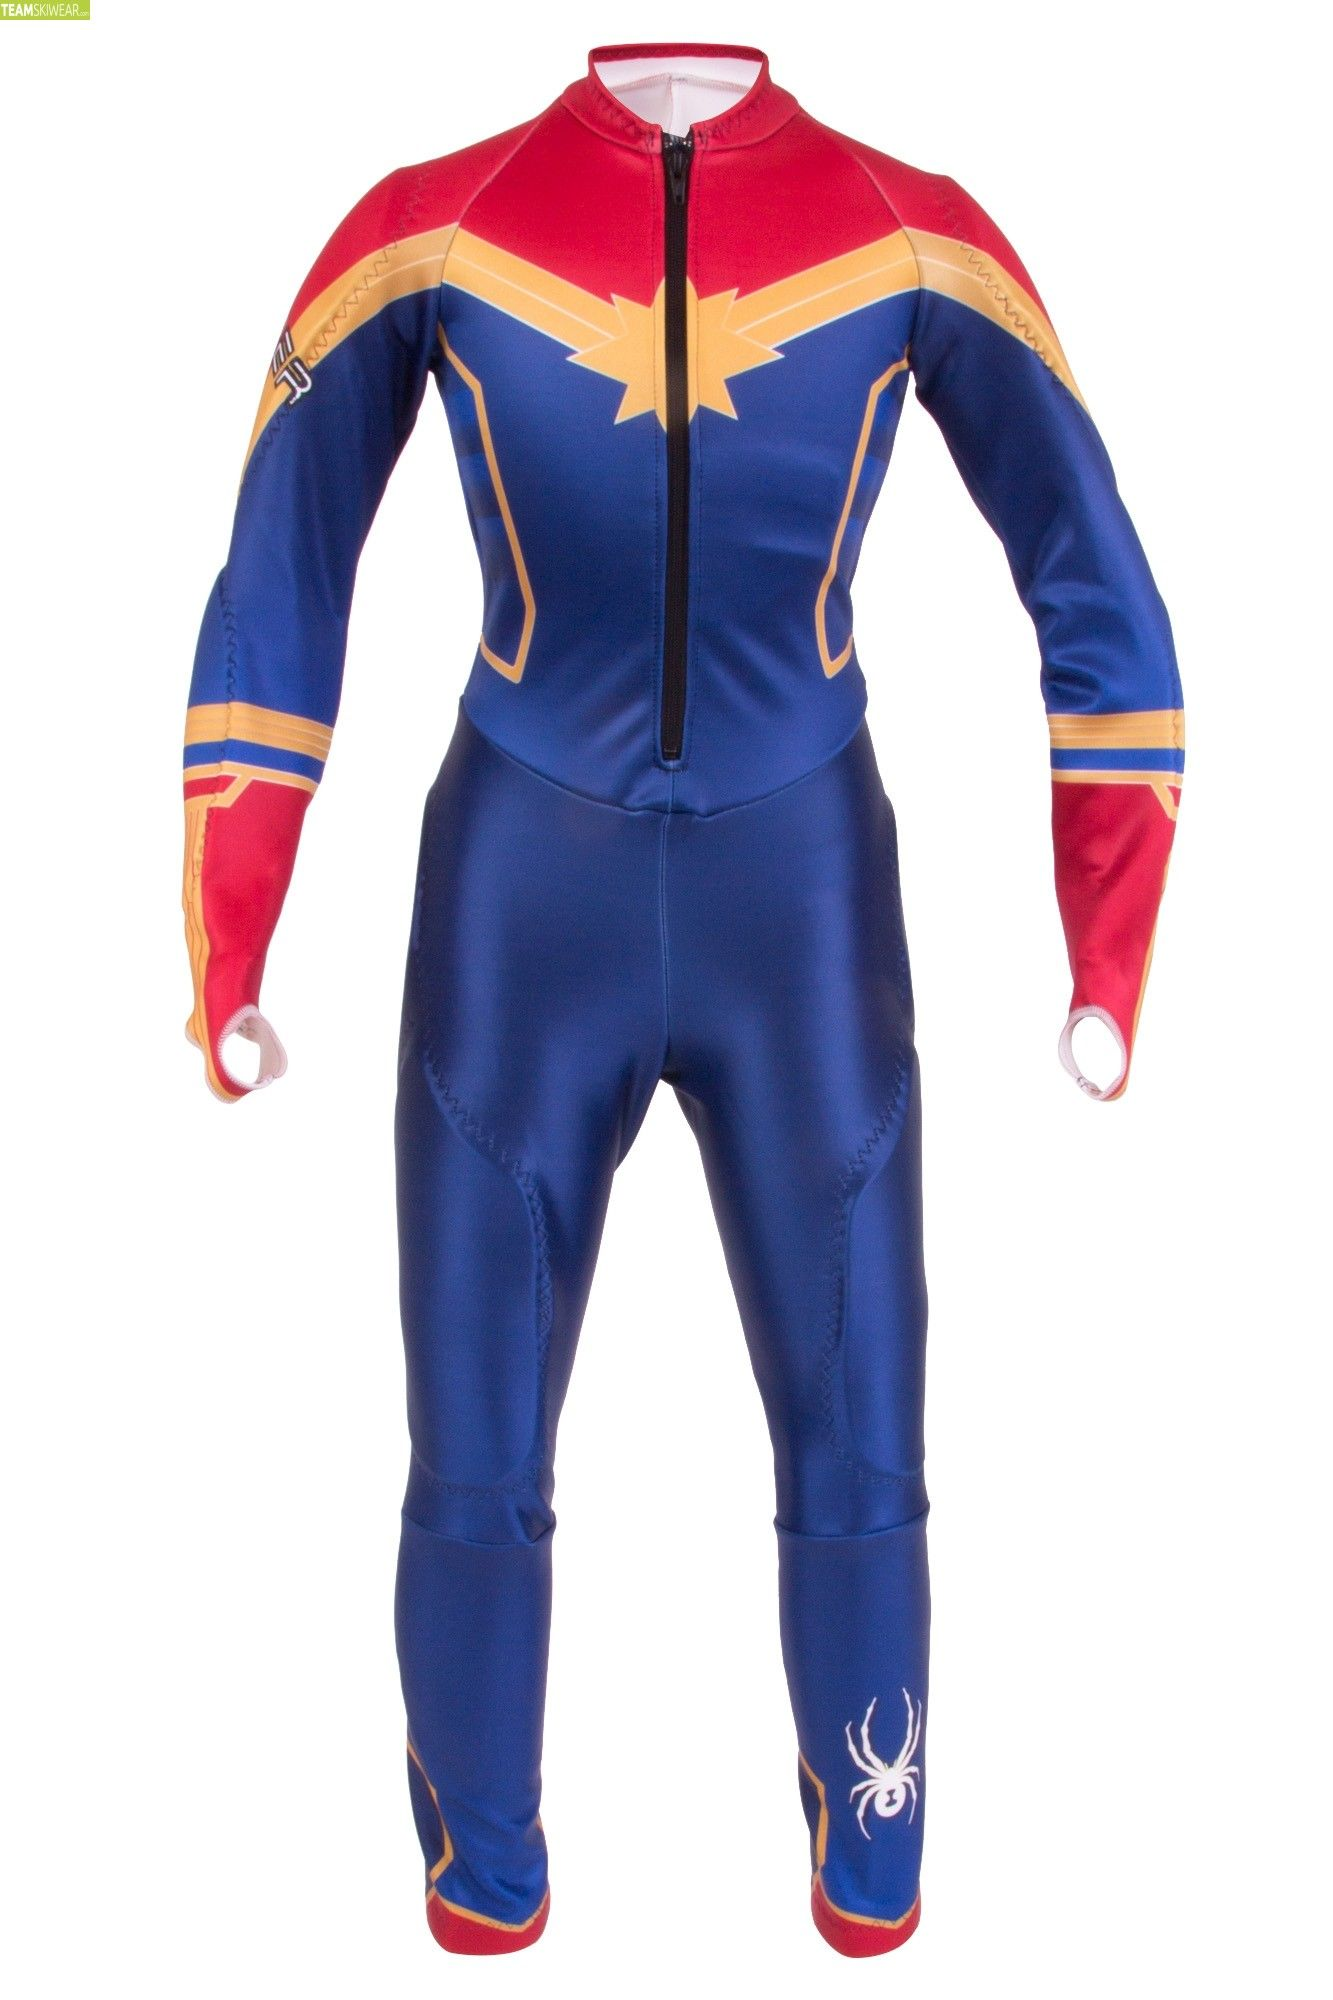 Spyder Girl Marvel Performance Limited Edition GS Race Suit - Captain Marvel c0eedffff946d